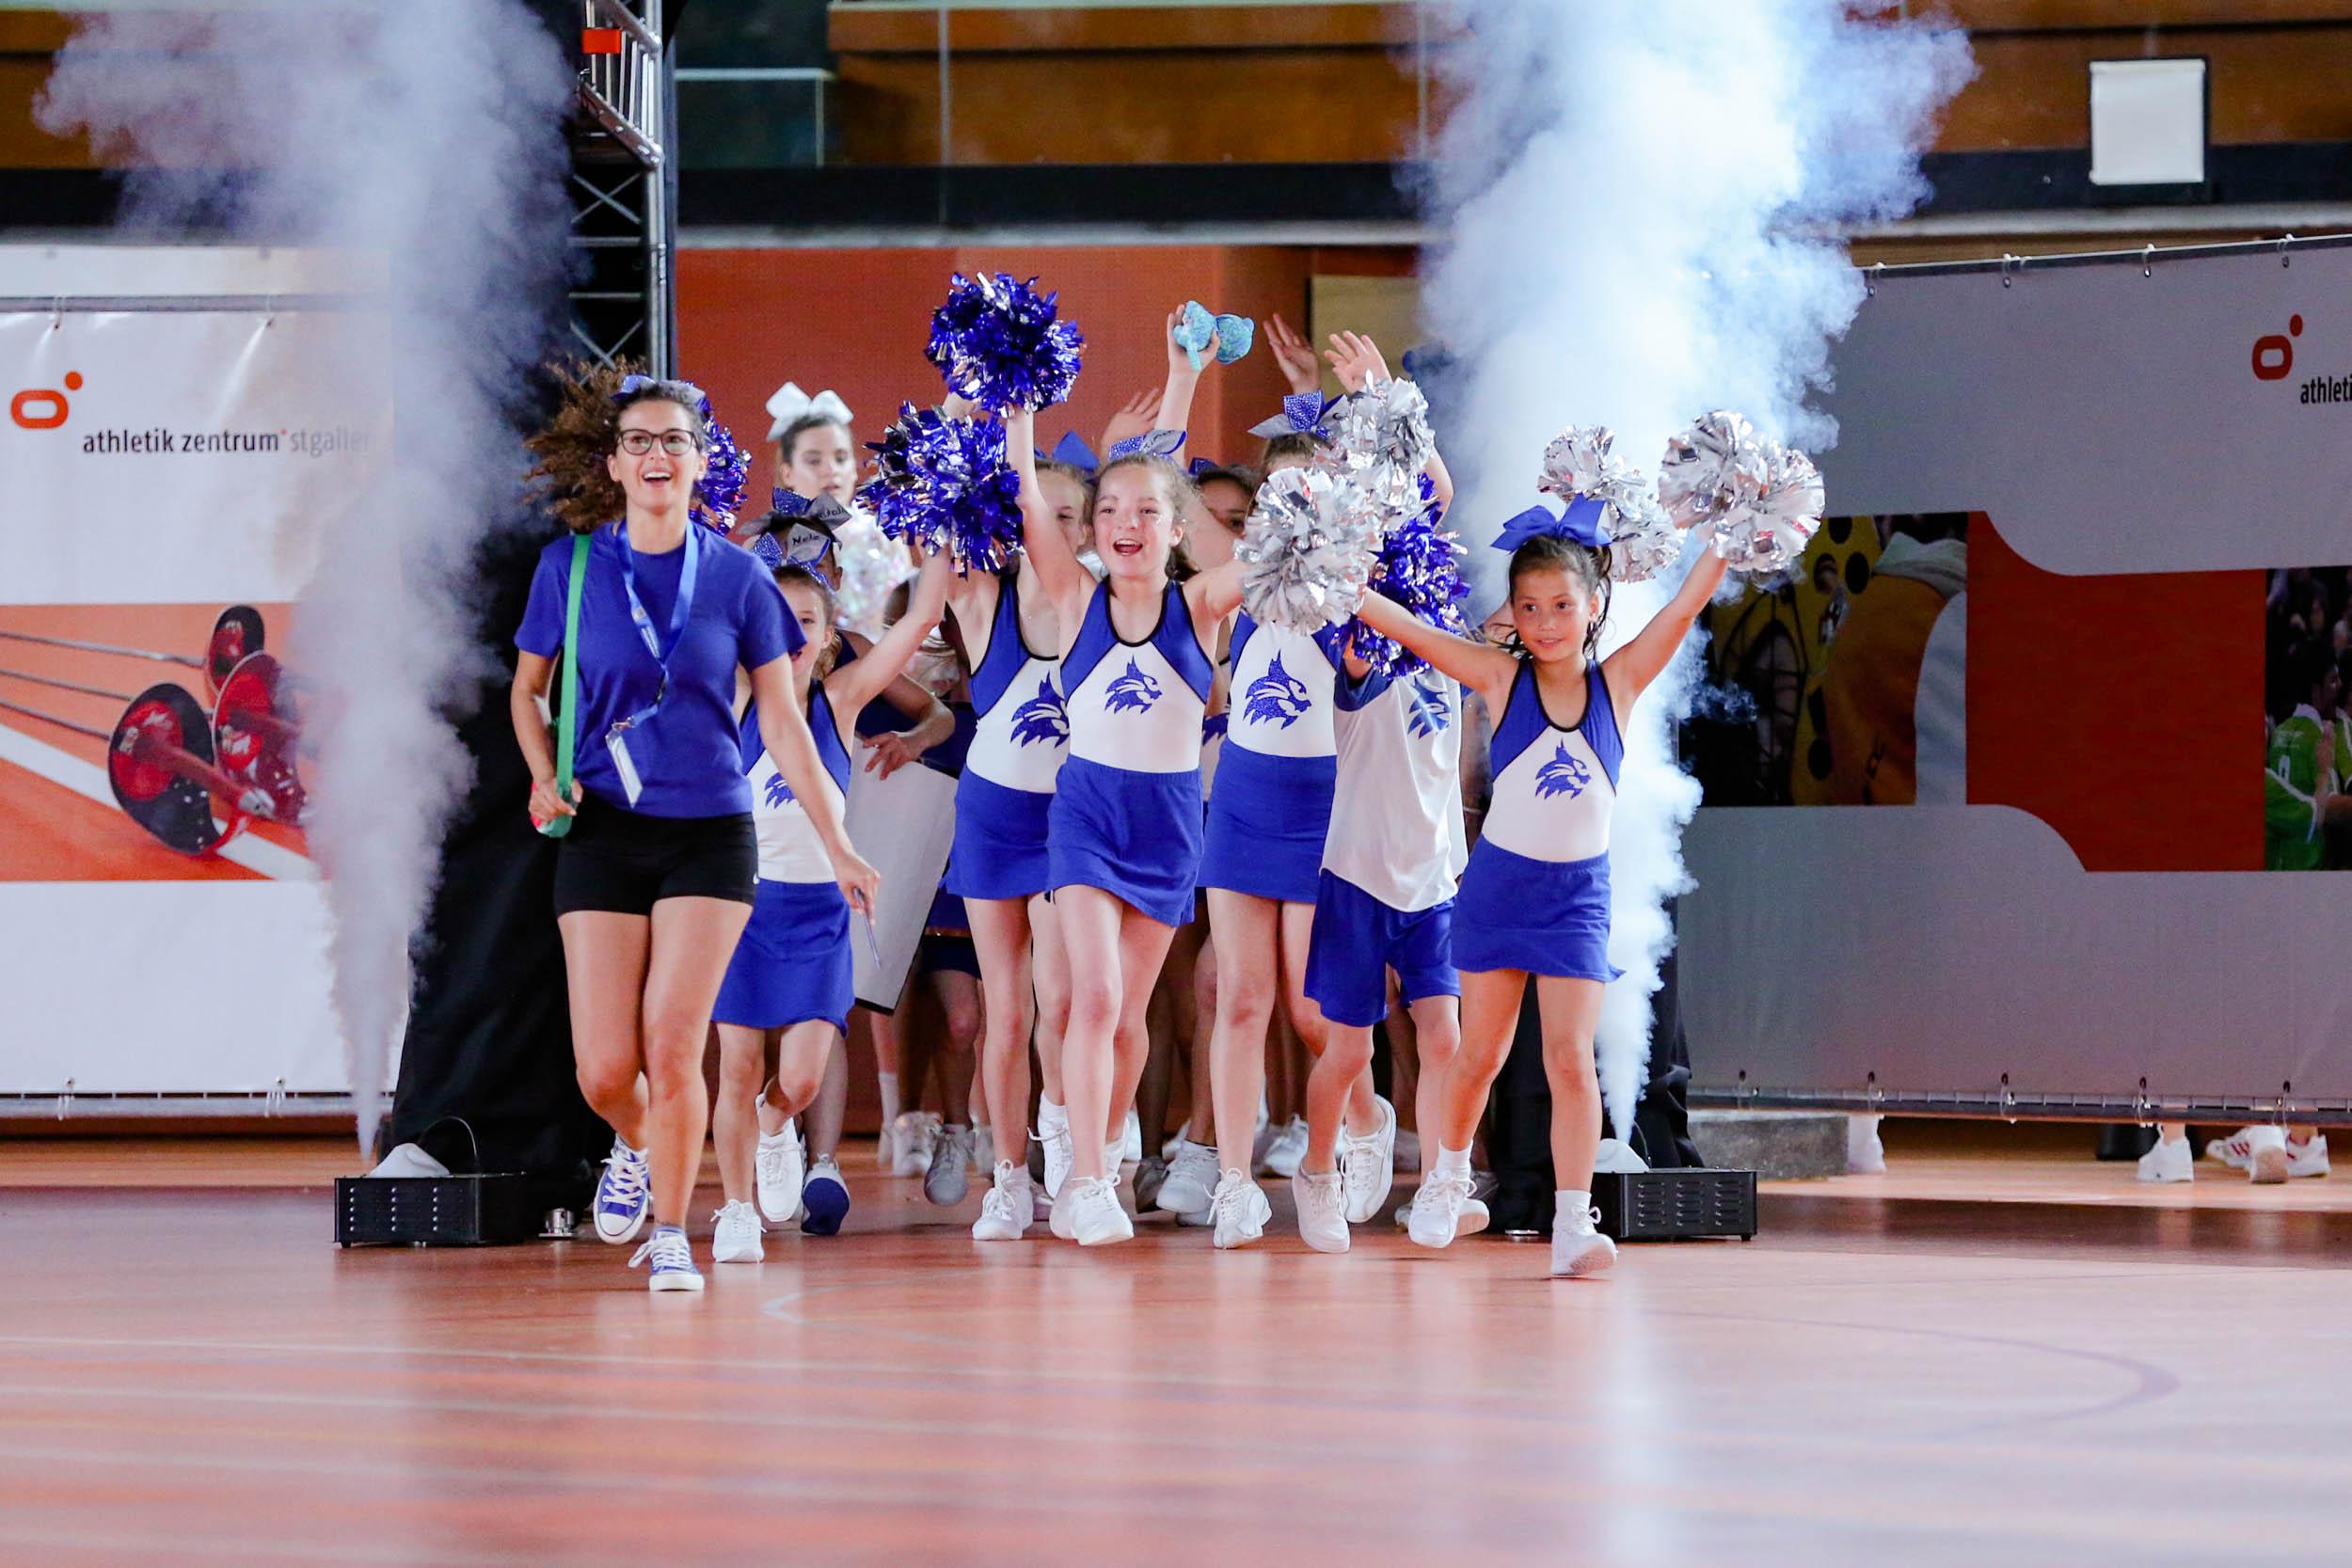 Luzern WIldcats Season 7 17/18